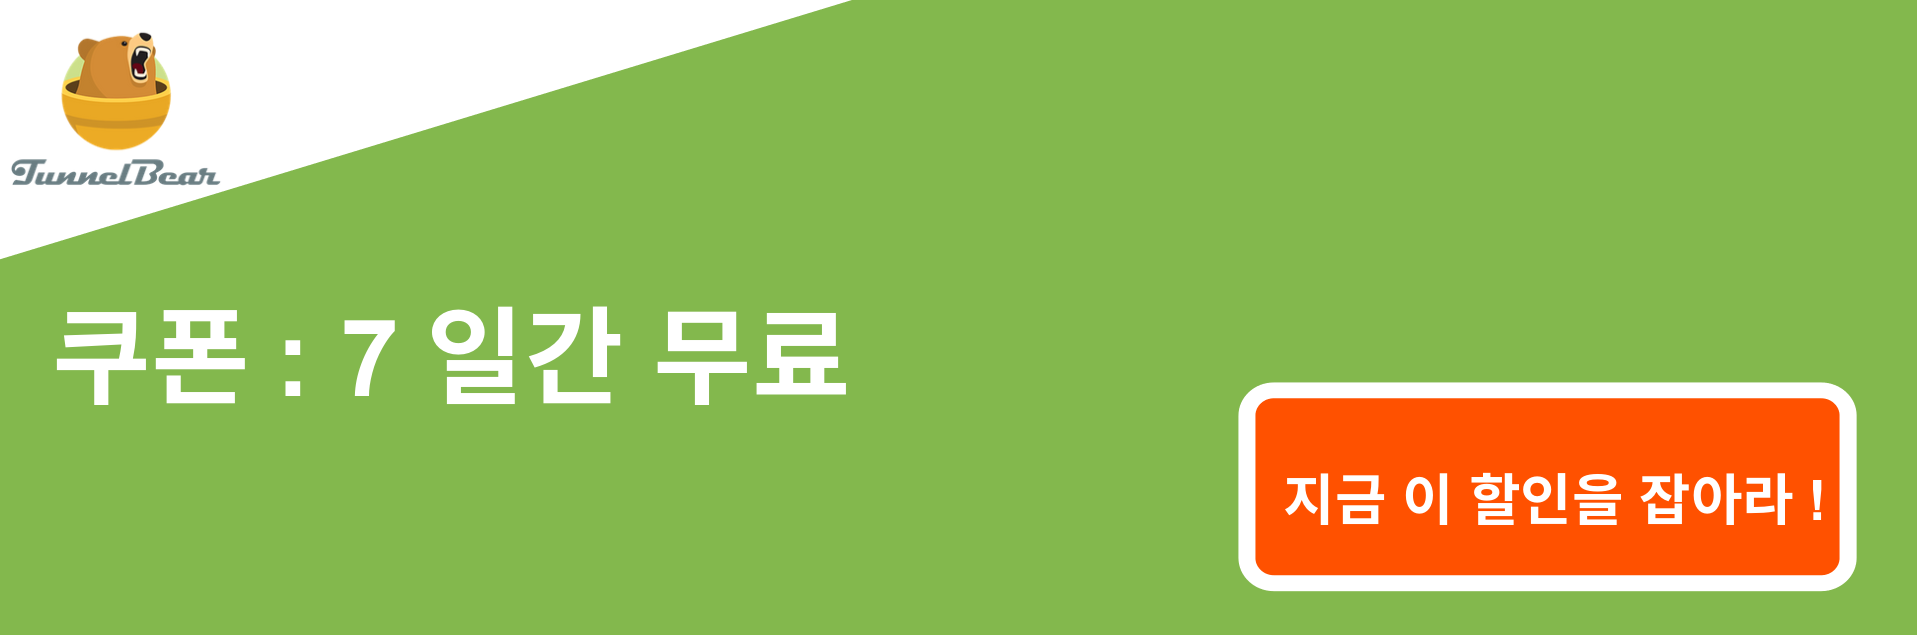 TunnelBear VPN 쿠폰 배너-7 일 무료